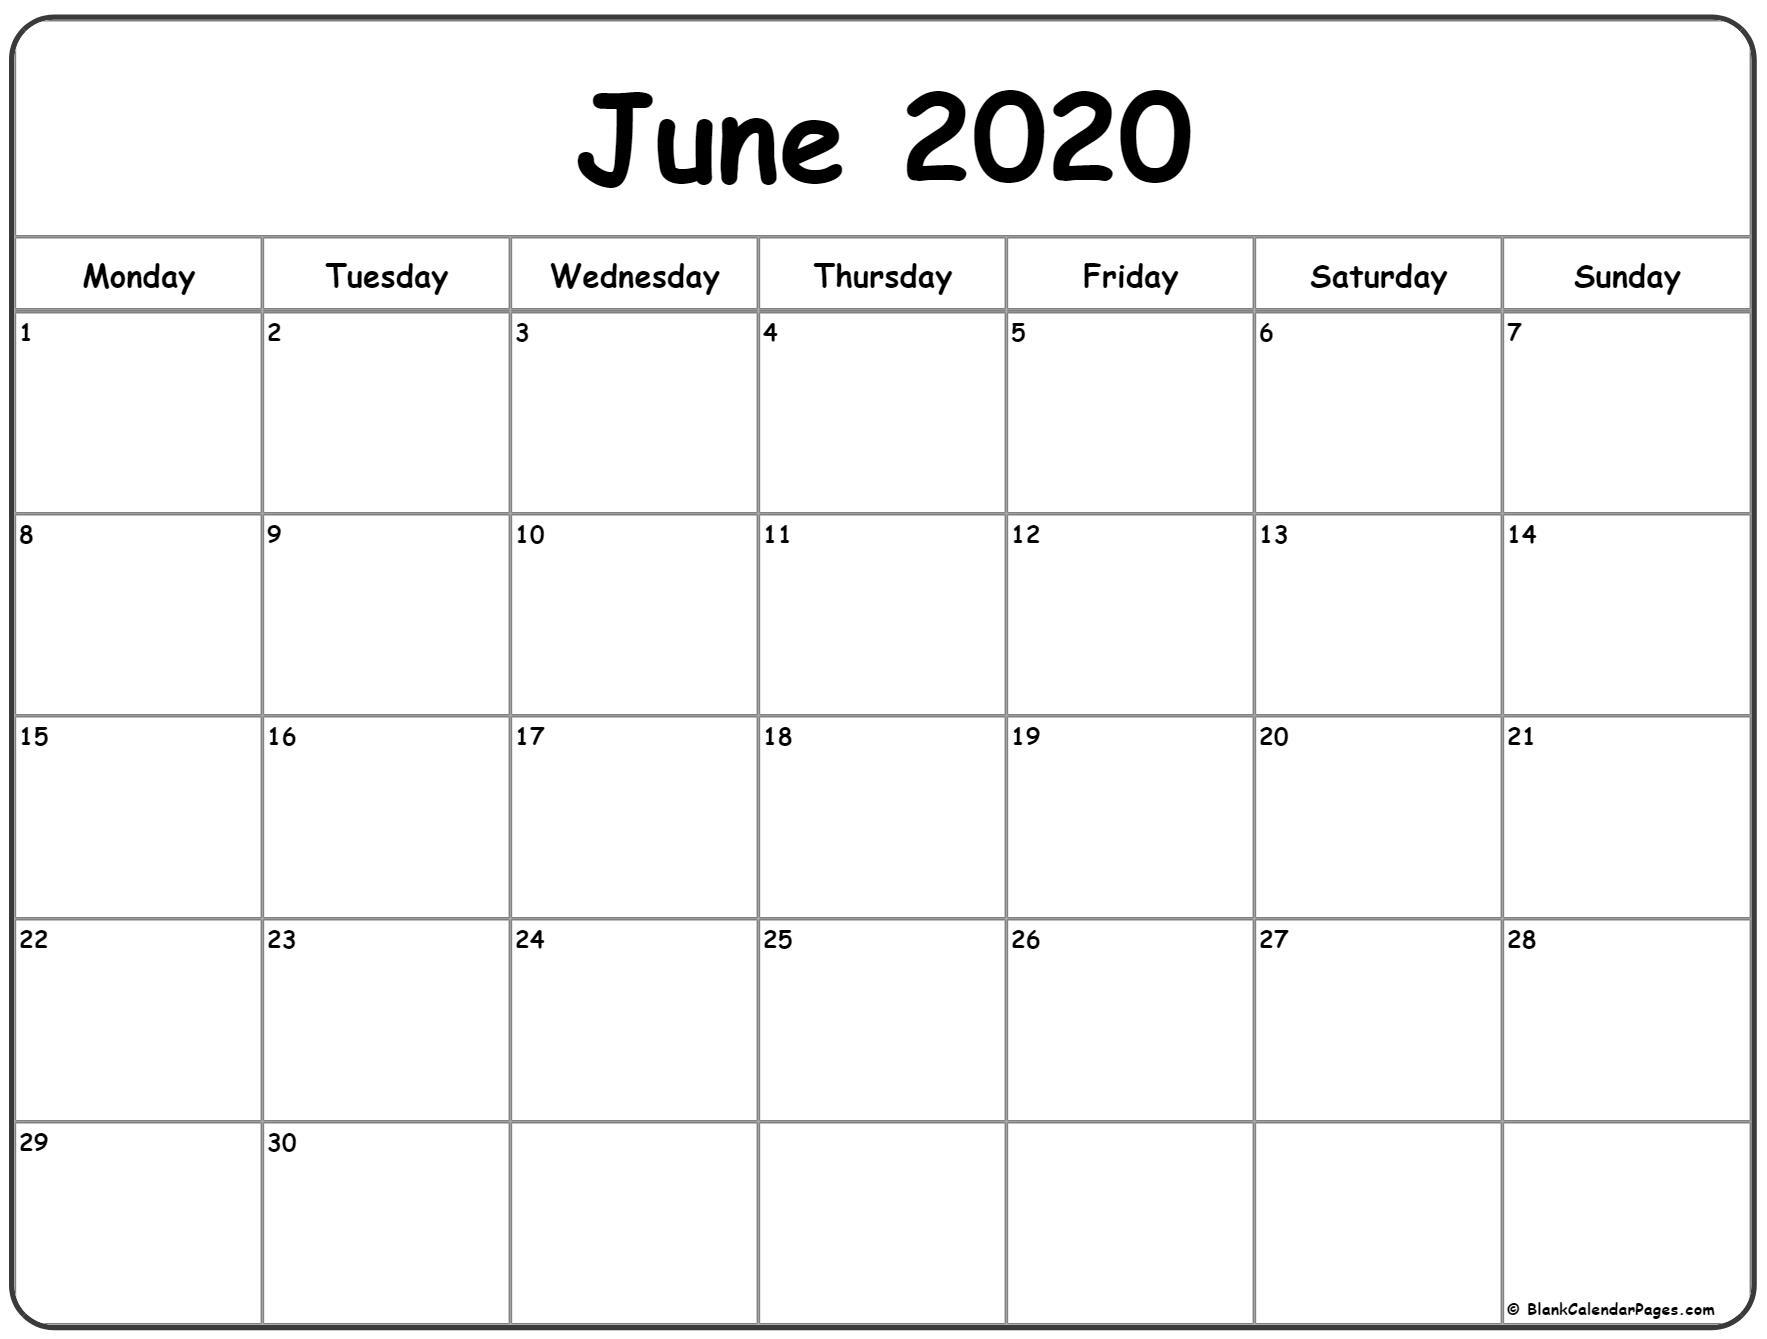 June Calendar 2020 Monday To Sunday